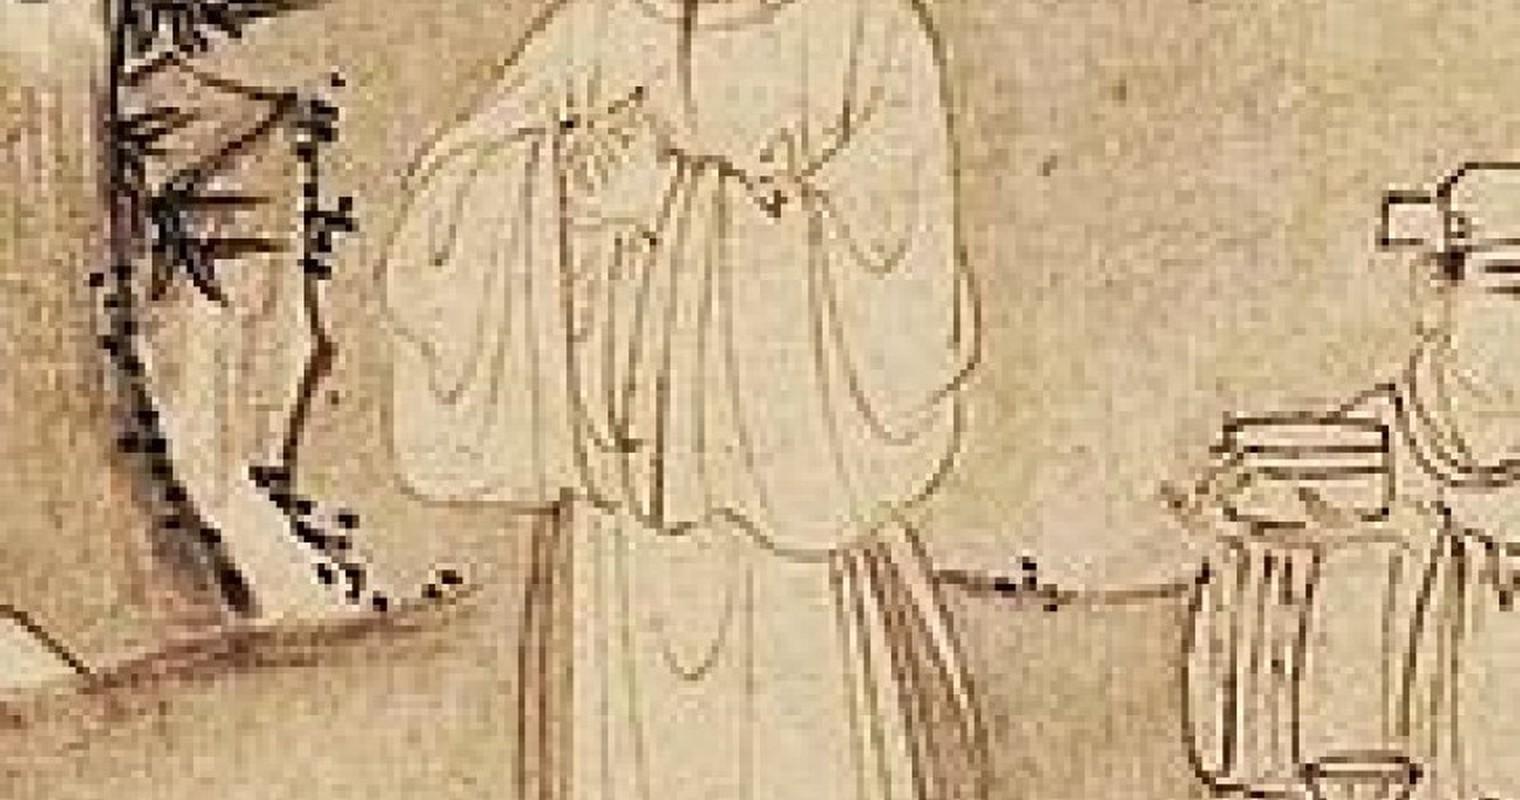 Nhung viec lam ky la cua vua hen Tran Phe De-Hinh-6